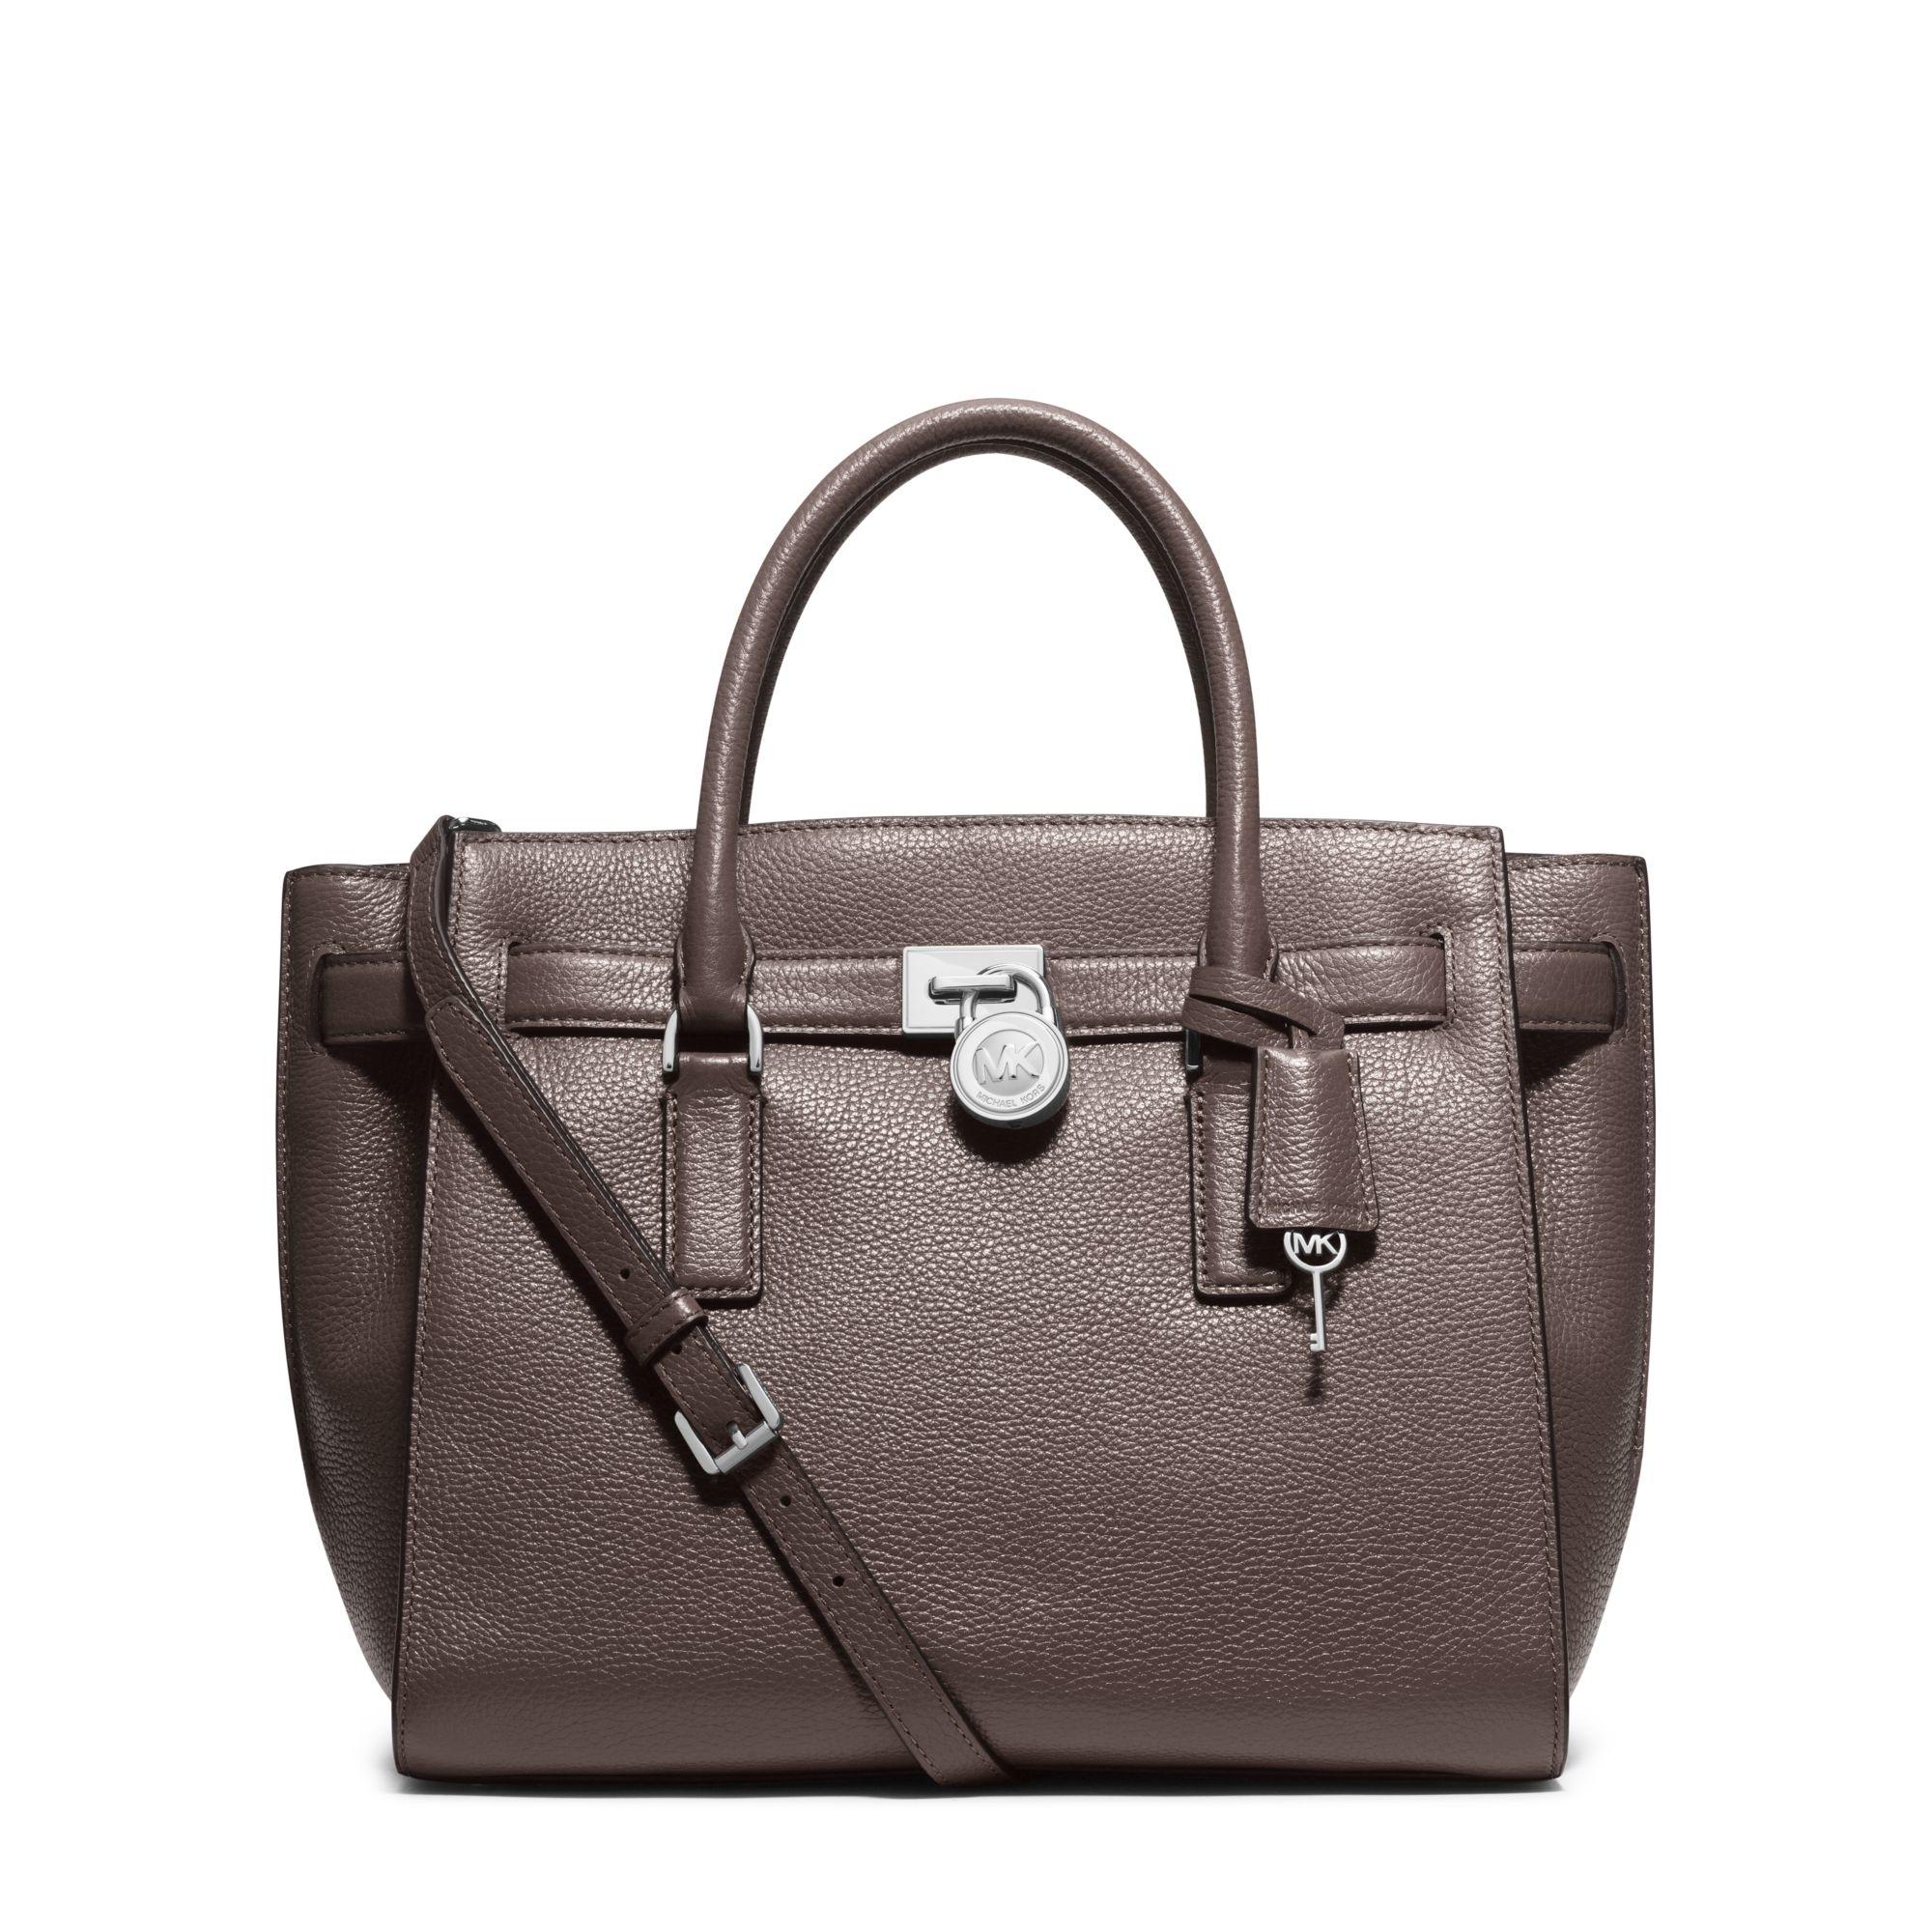 michael kors hamilton traveler large leather satchel in gray lyst. Black Bedroom Furniture Sets. Home Design Ideas